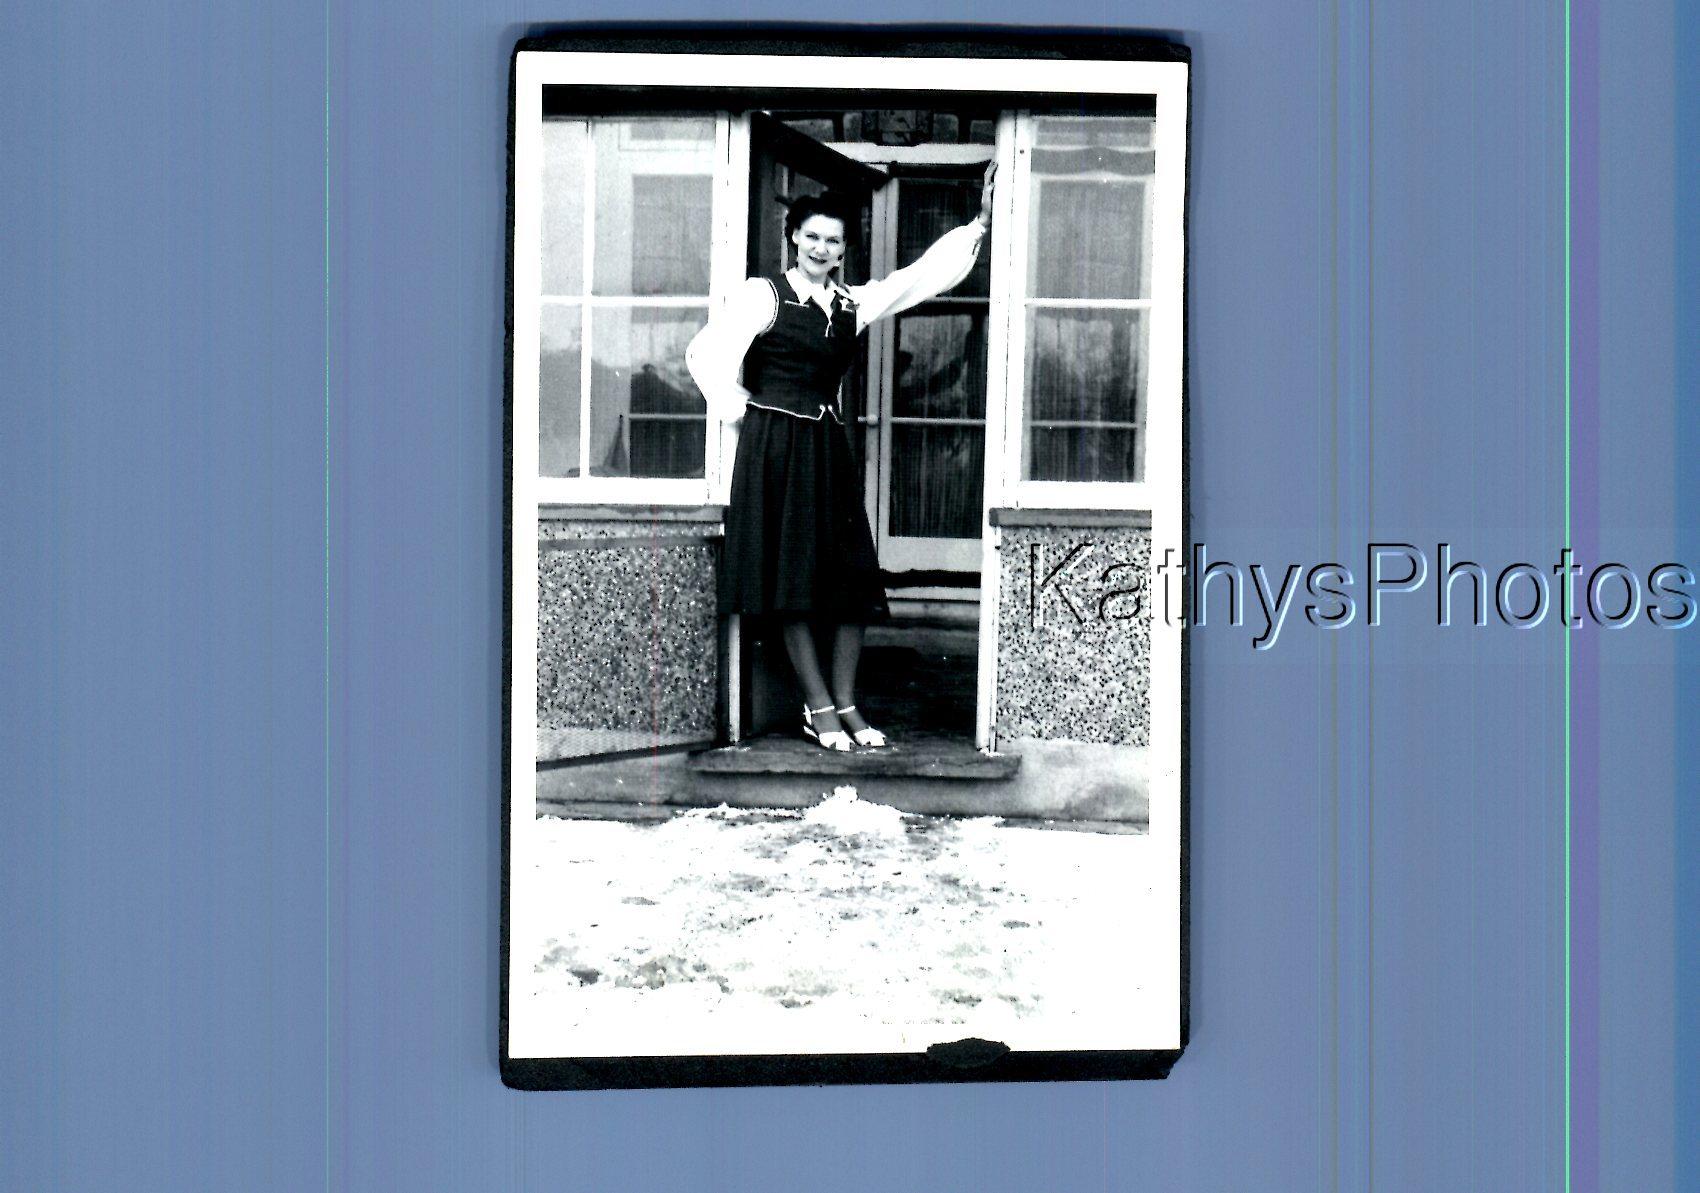 Populair Merk Found B&w Photo K_0162 Pretty Woman In Dress Posed On Porch